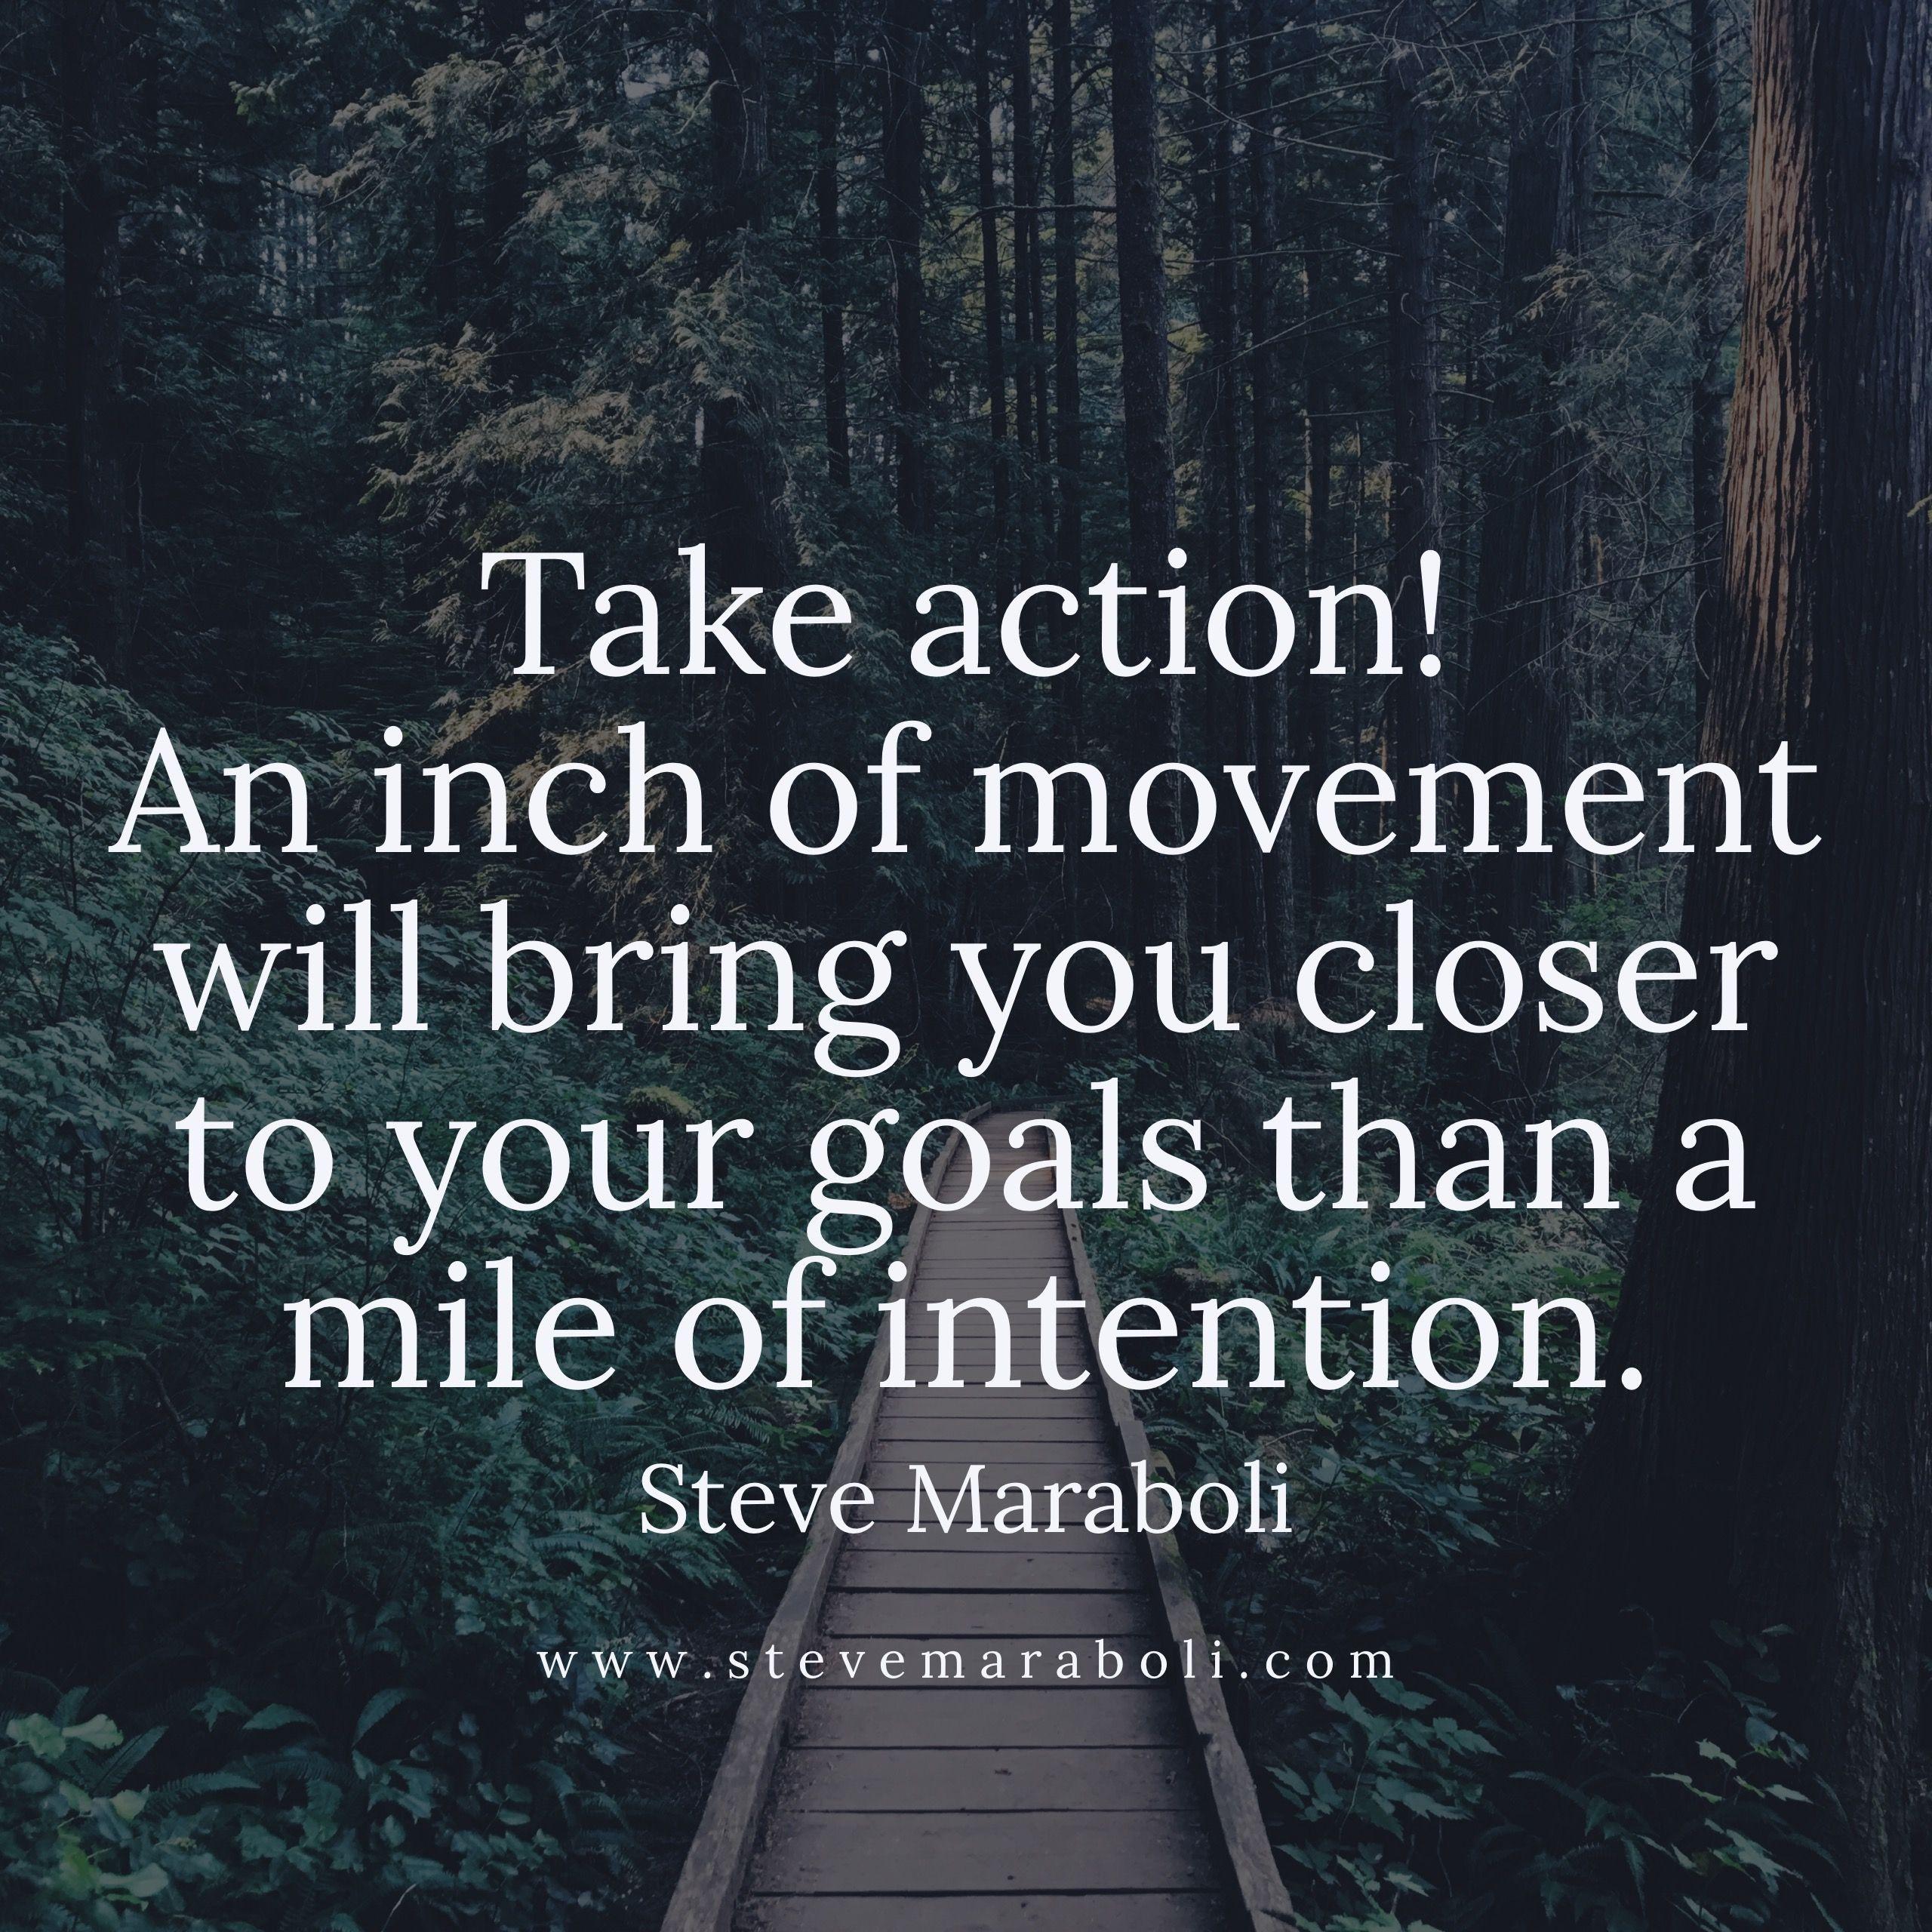 Best Motivational Quotes For Success: Best Success Quotes, Quotes